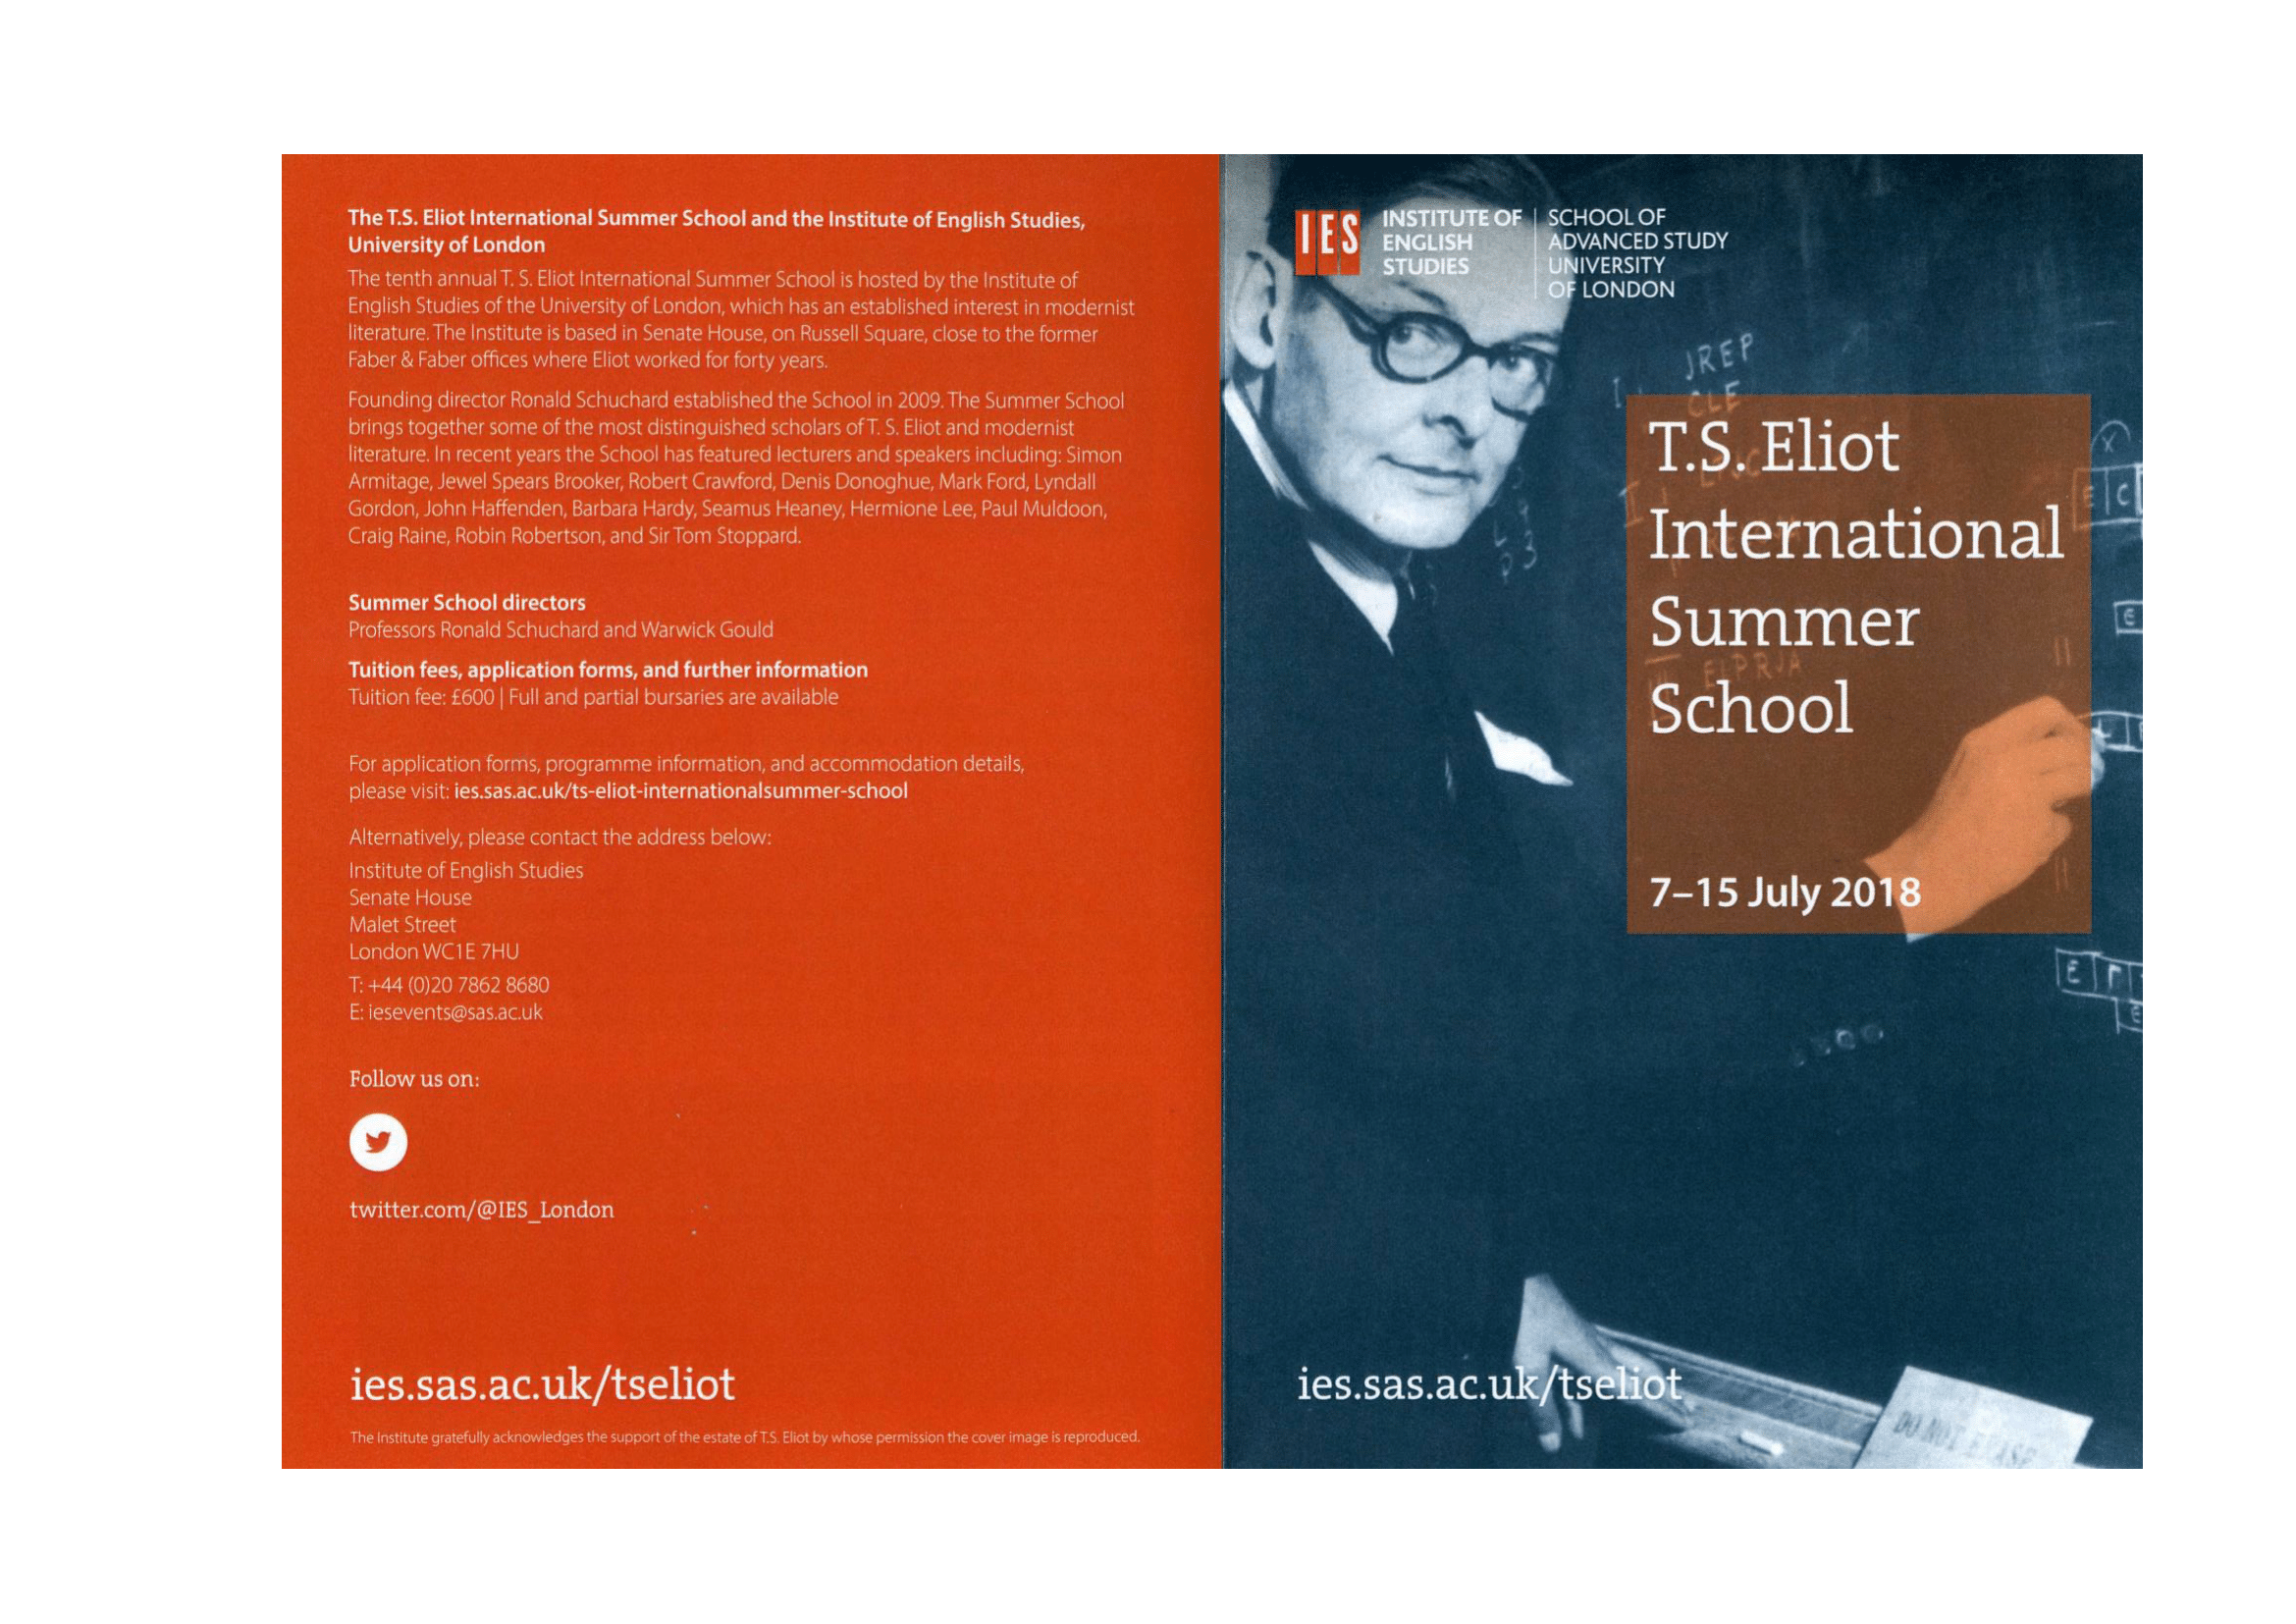 T. S. Eliot International Summer School